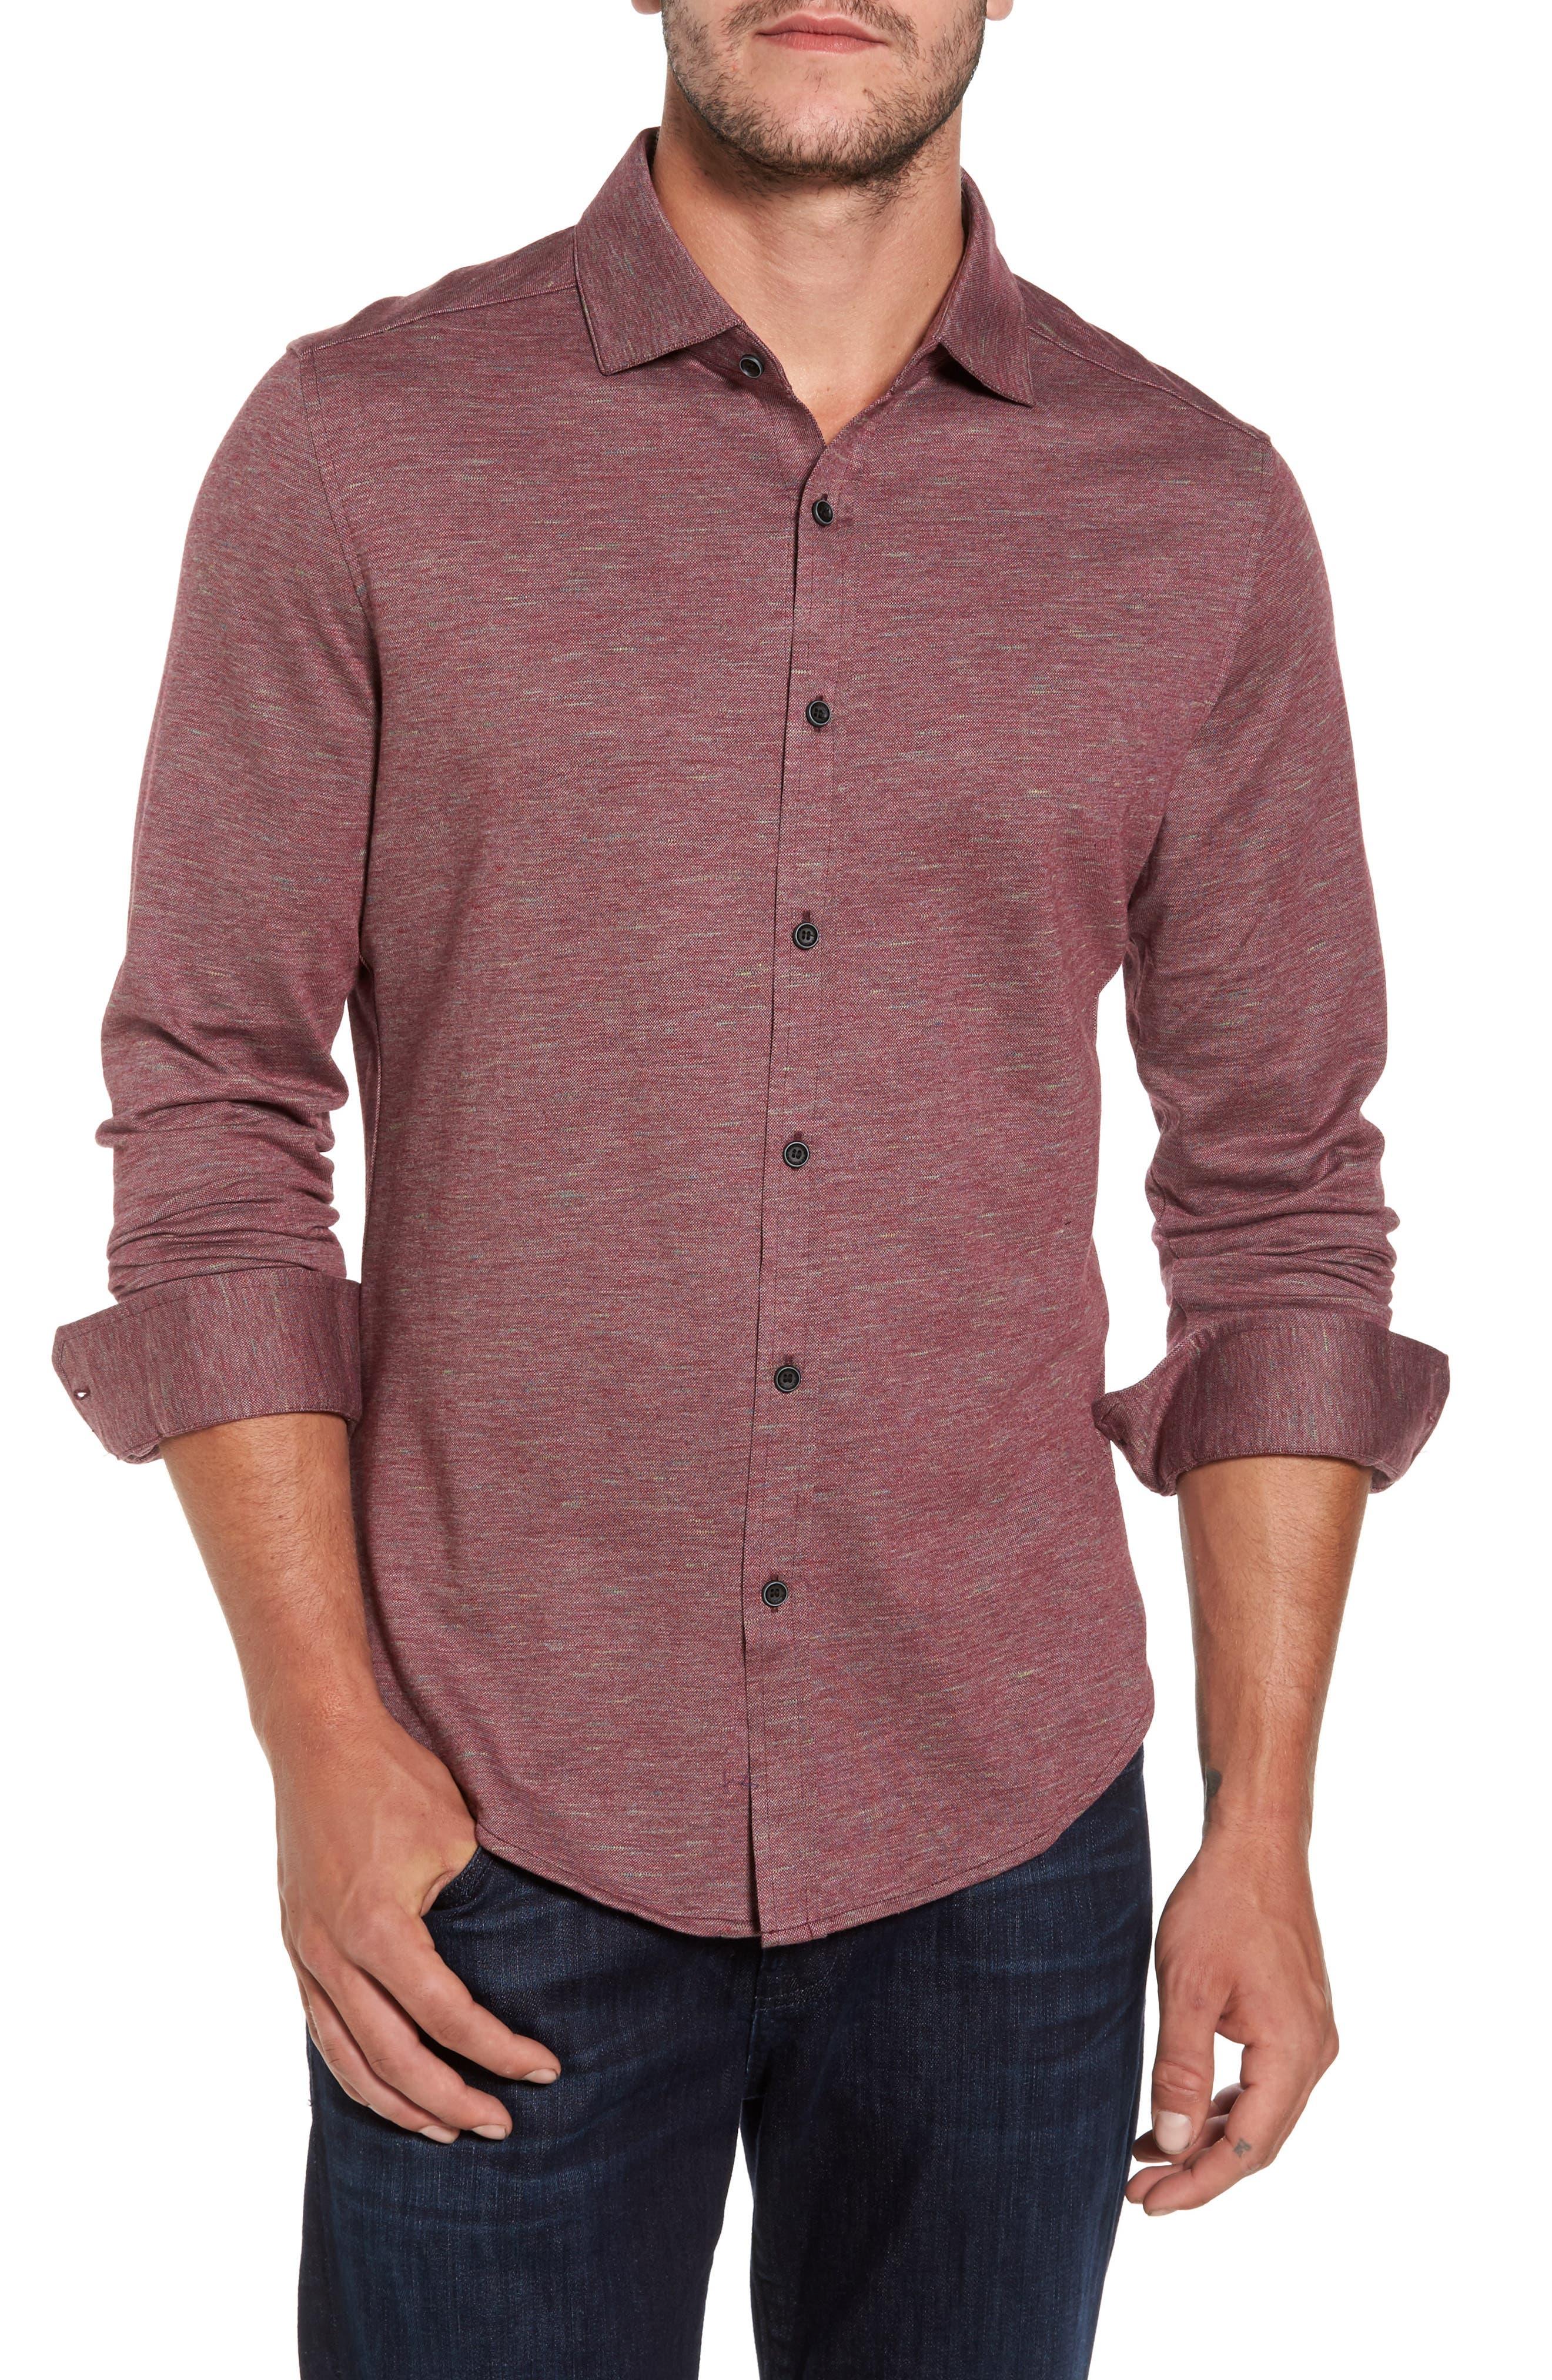 Main Image - Bugatchi Regular Fit Piqué Knit Sport Shirt